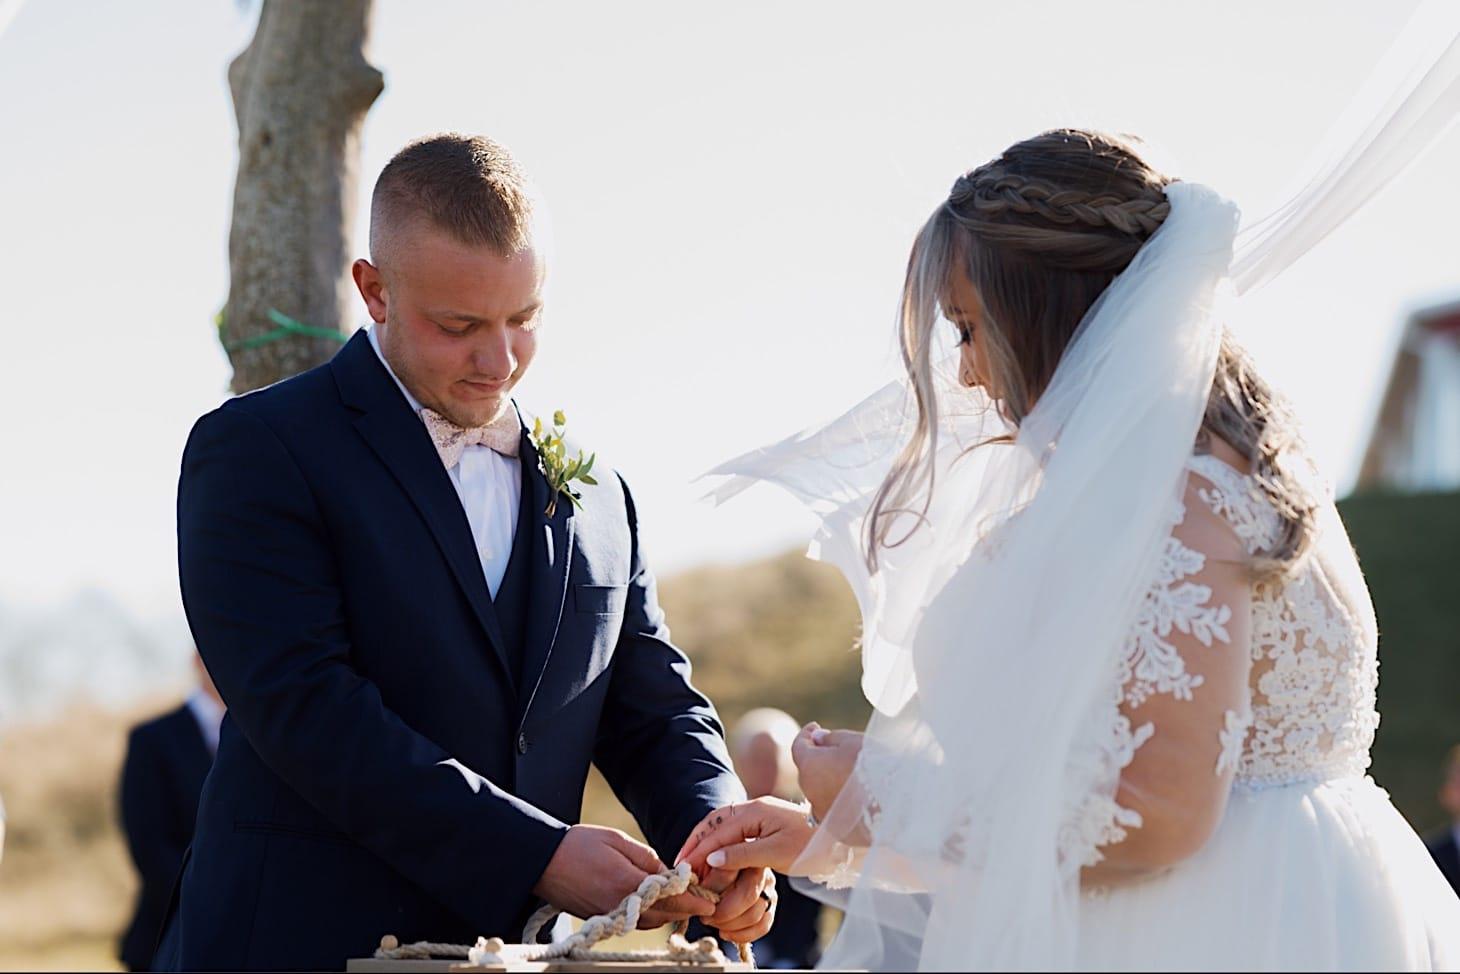 wedding vows at Des Moines wedding ceremony